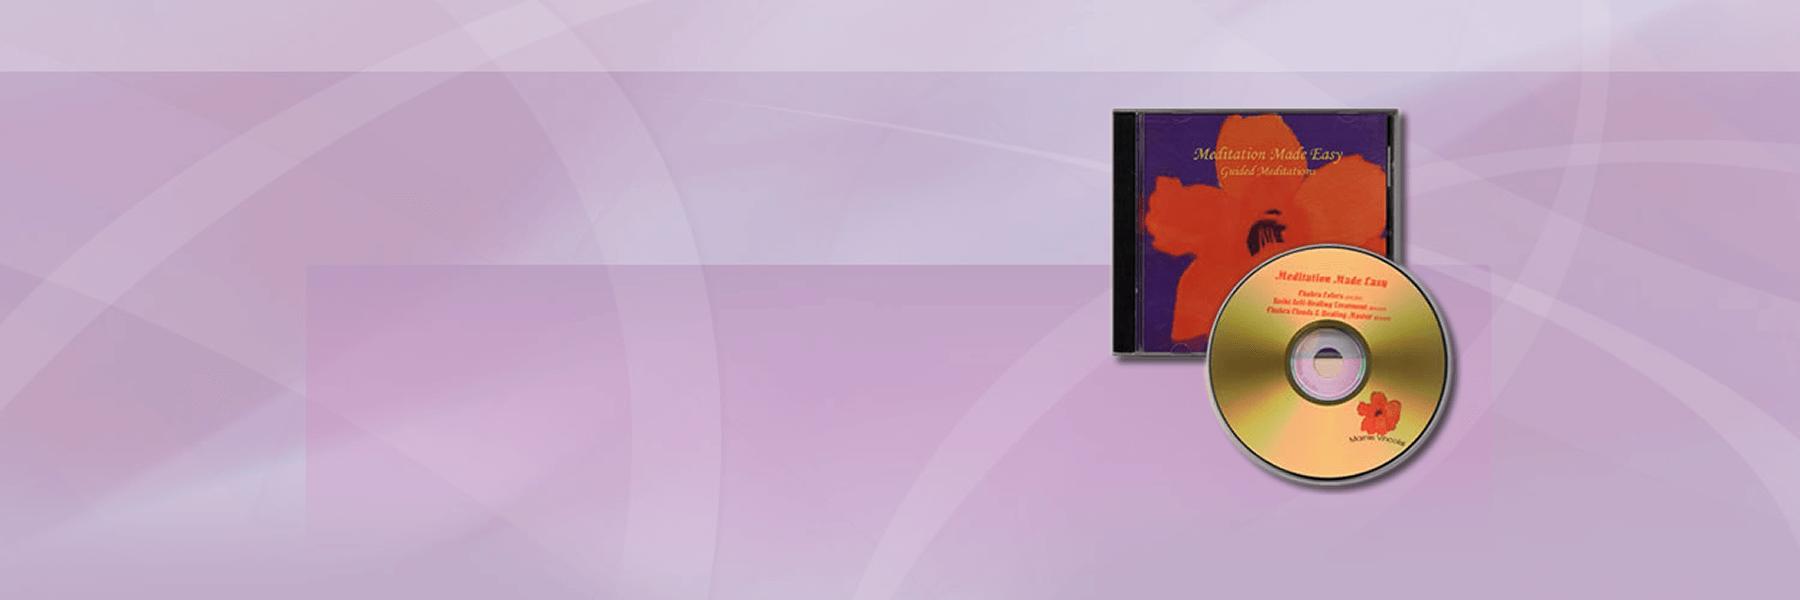 Meditation Made Easy MP3 & CD Slider